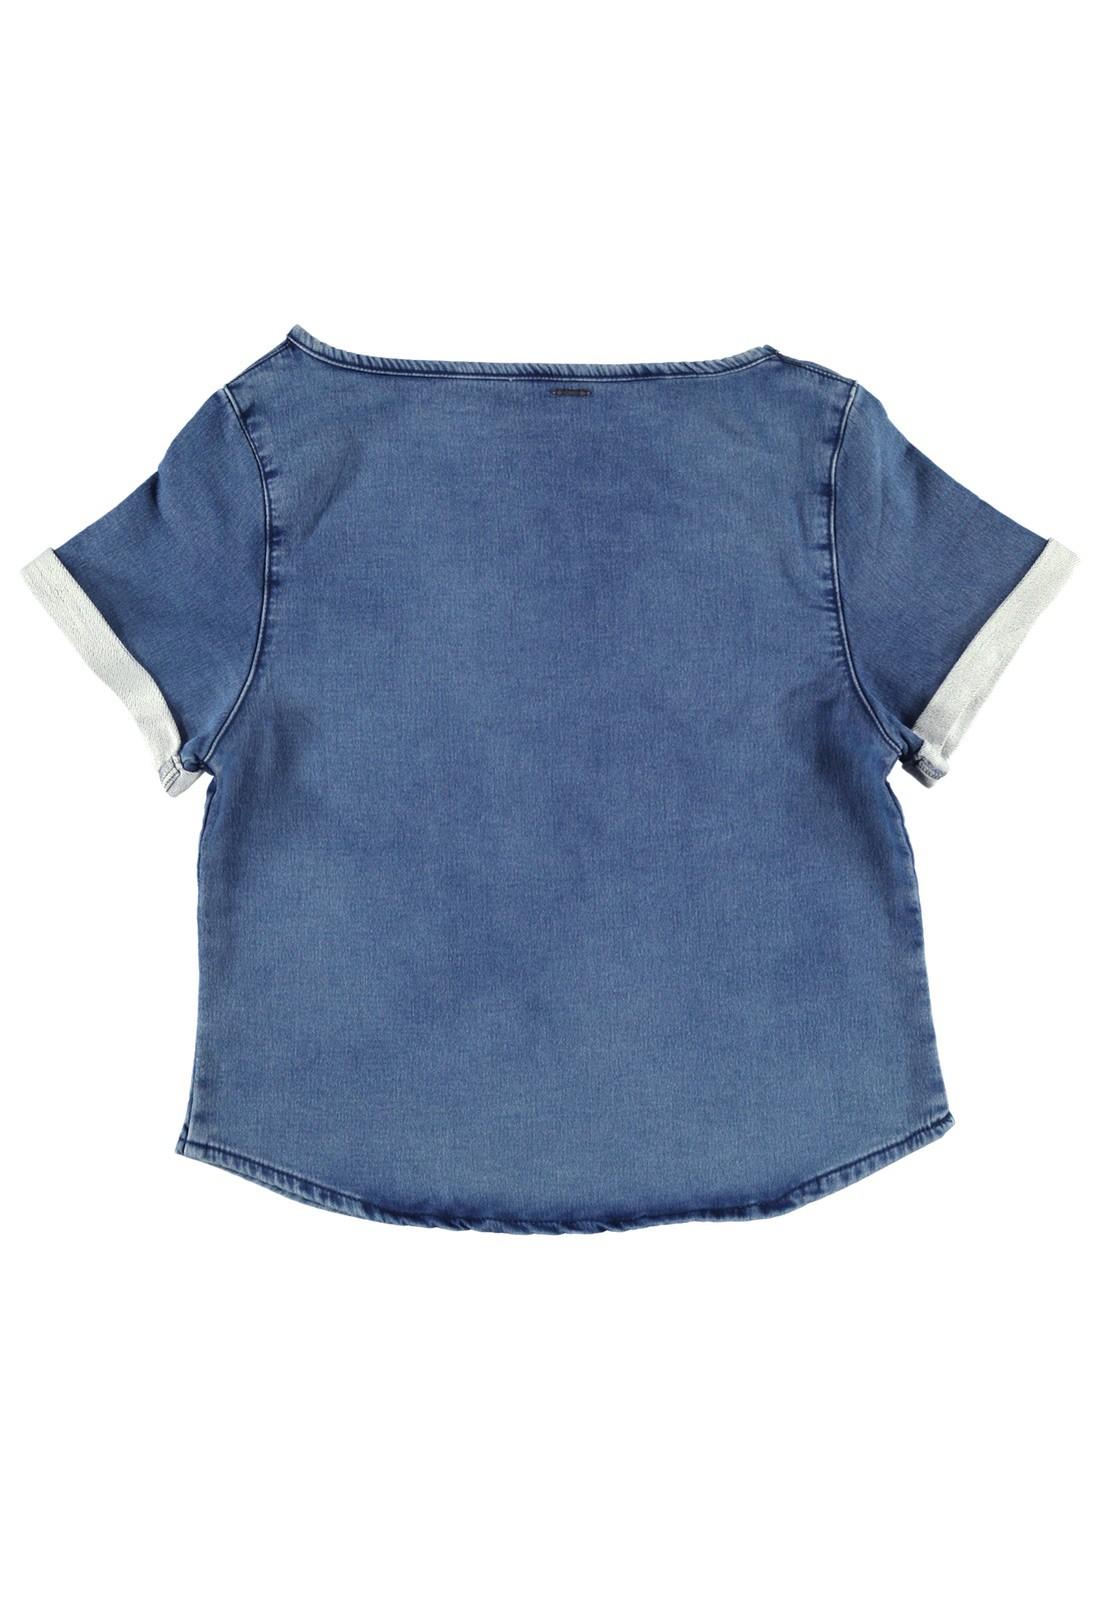 Camiseta T-Shirt Jeans Moletom Crawling c/Estampa